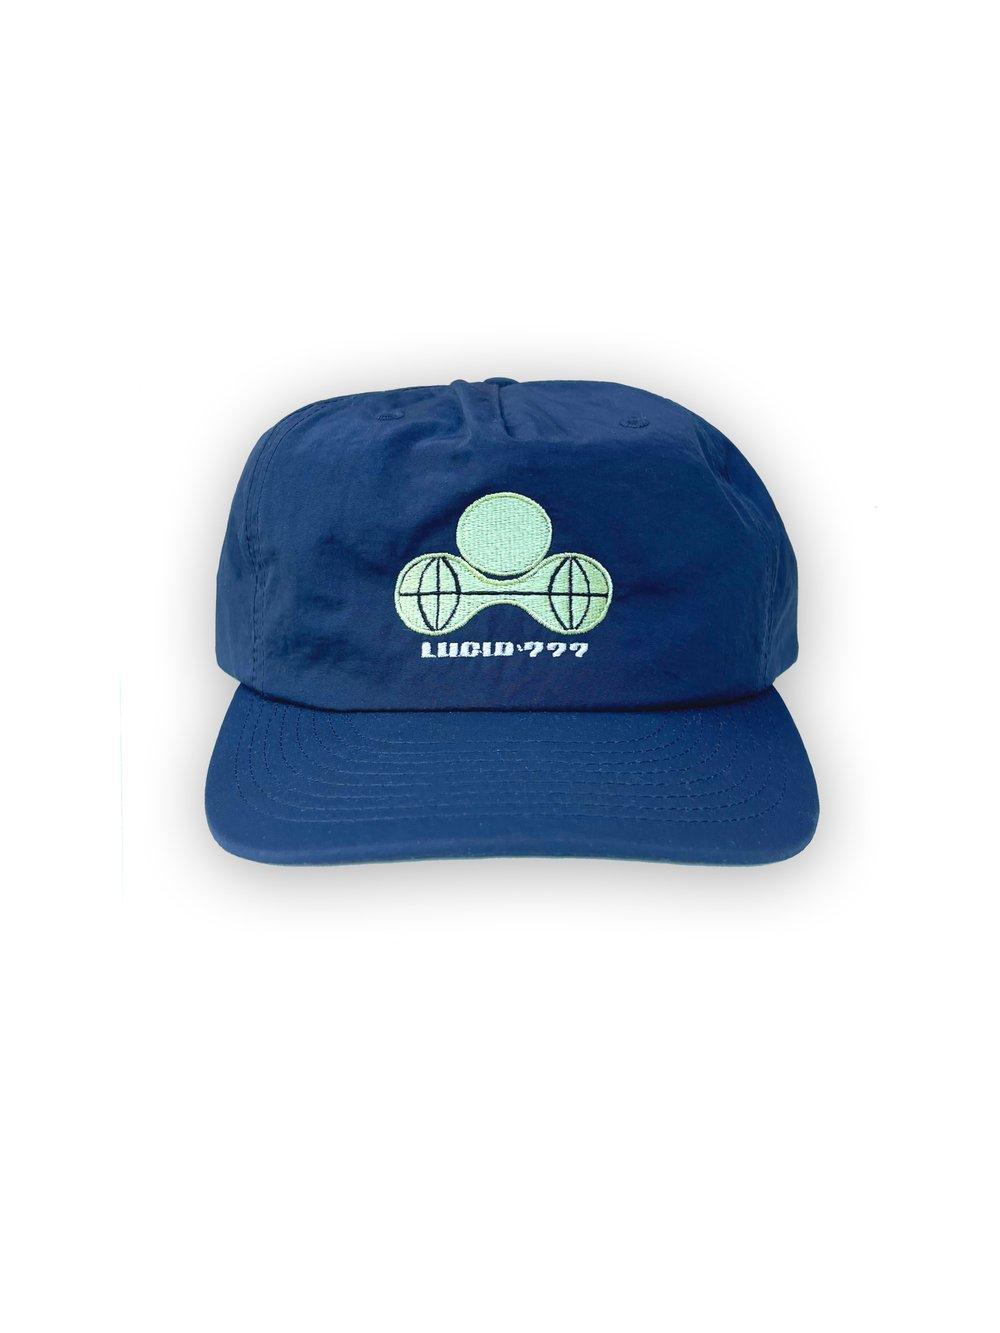 Image of NYLON SURF SPACE SNAPBACK HAT